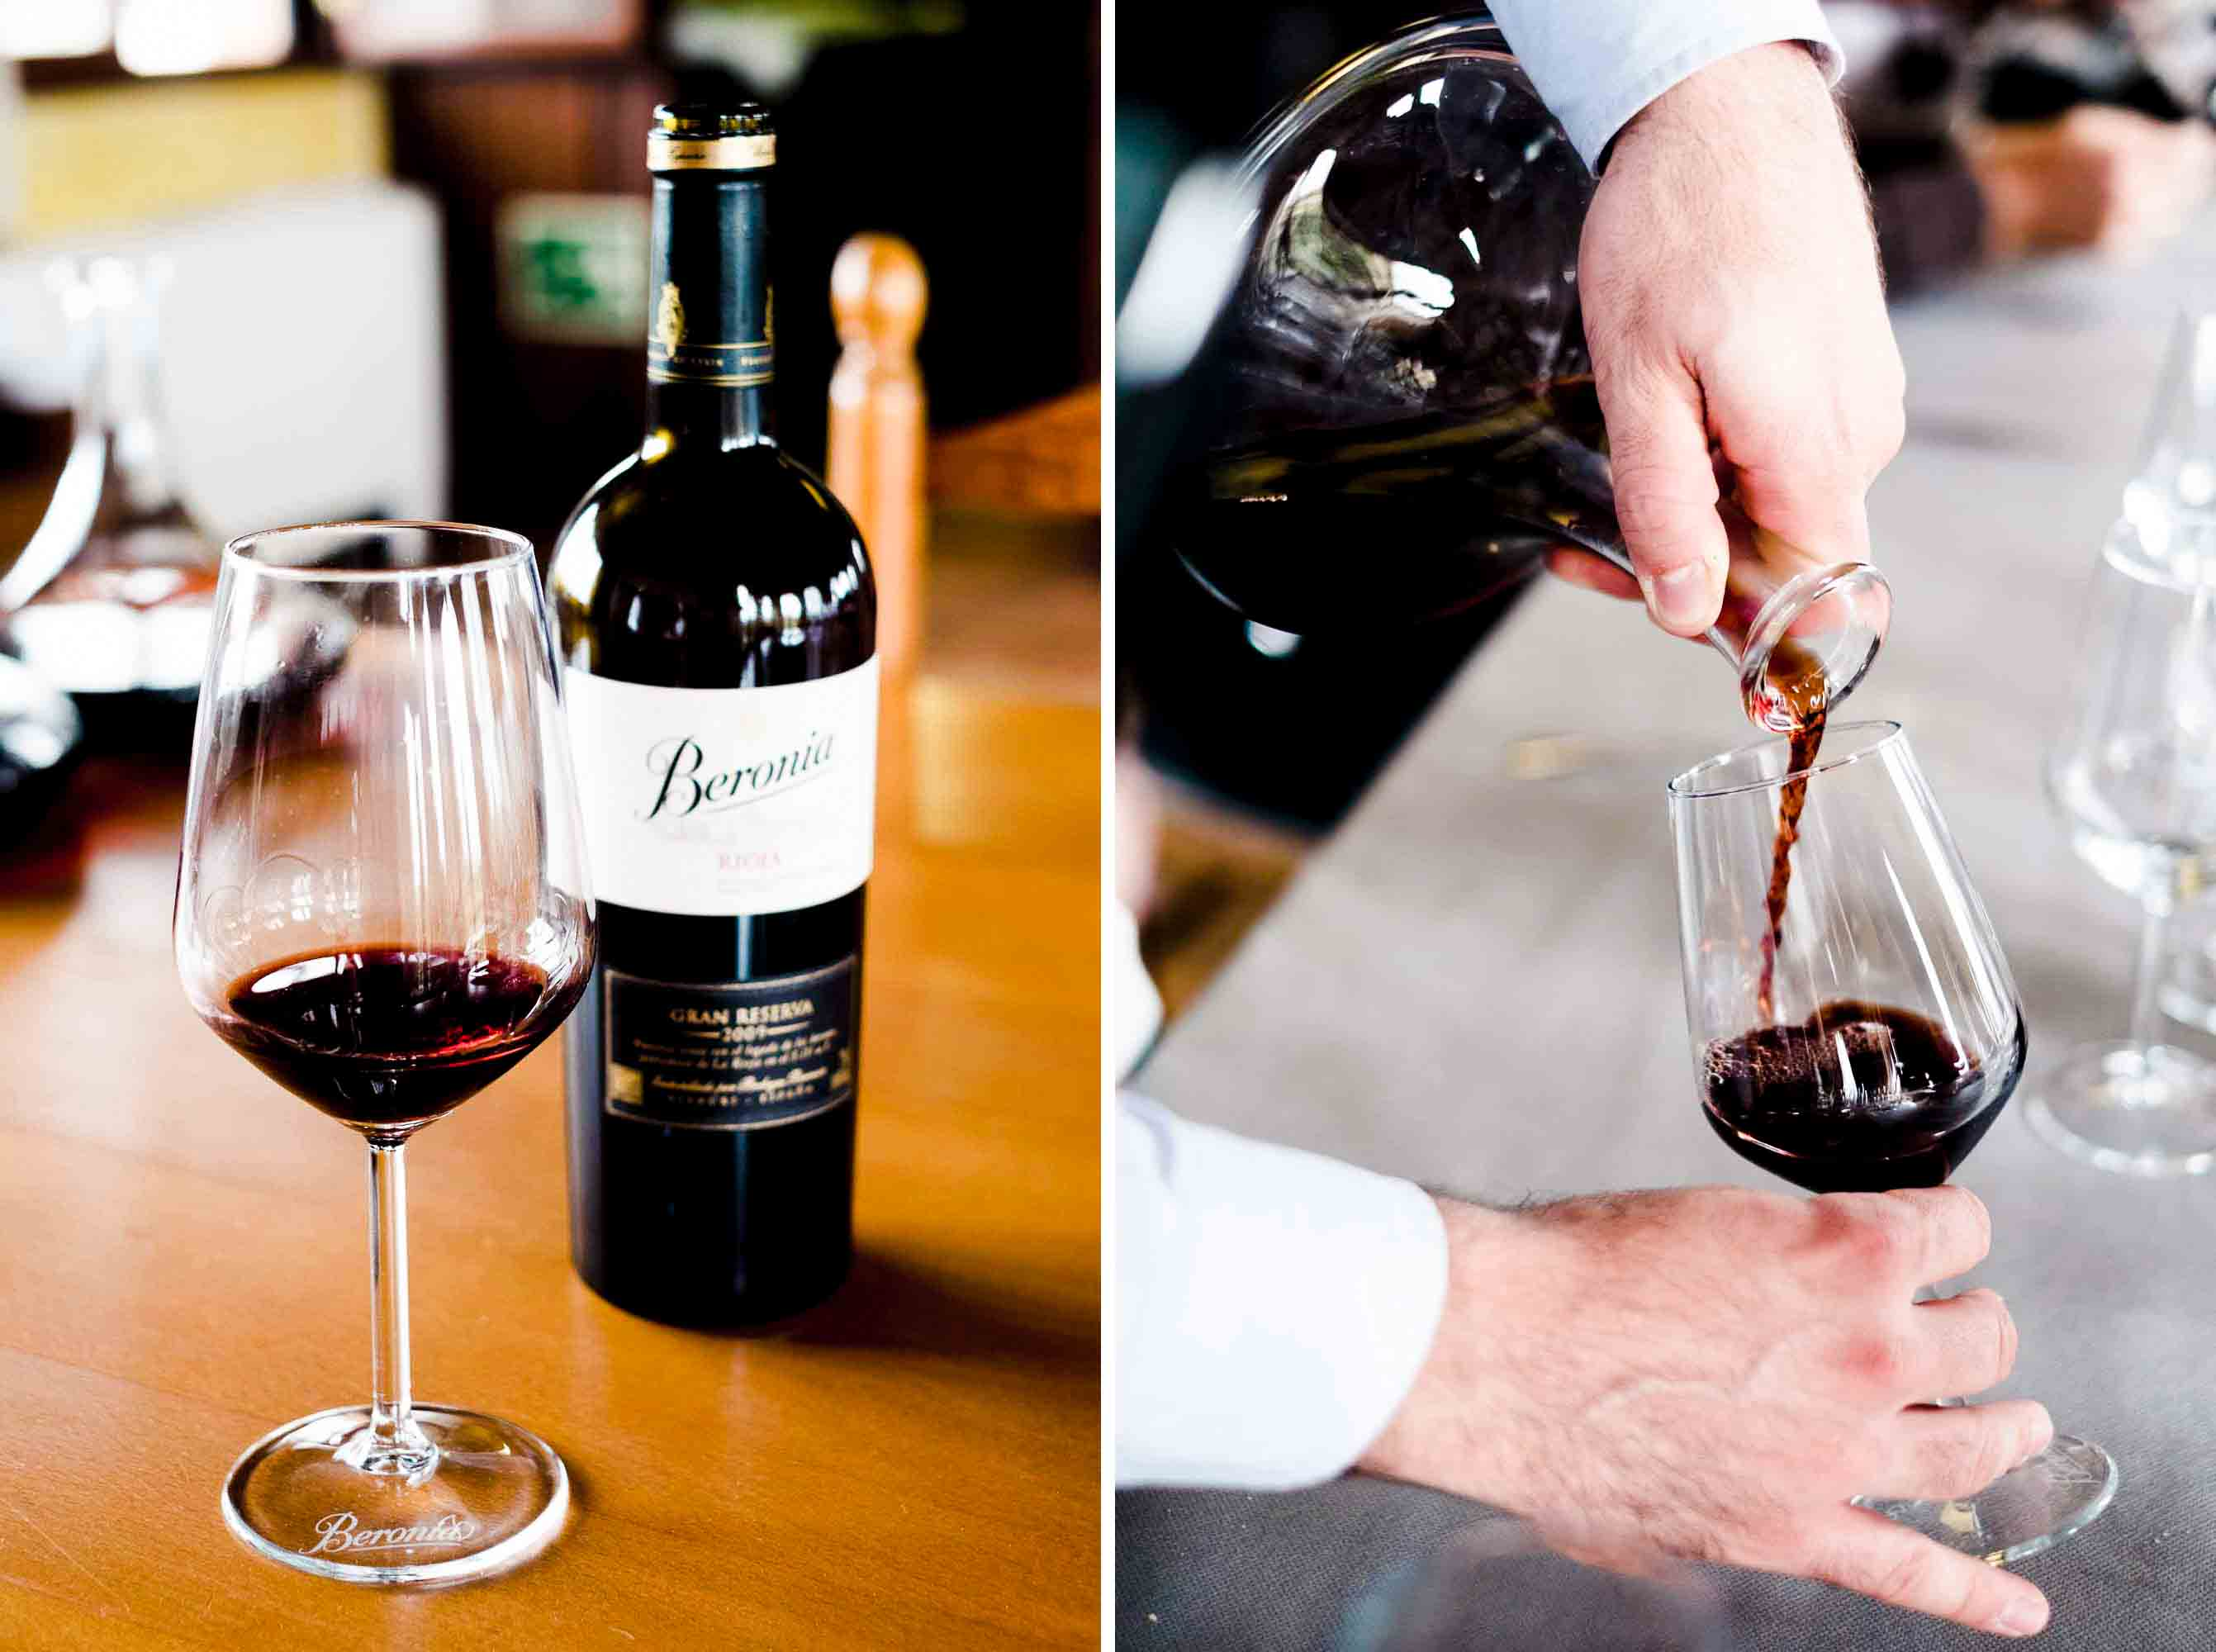 My Wine Tour of Beronia Winery in Ollauri, Rioja - Spain